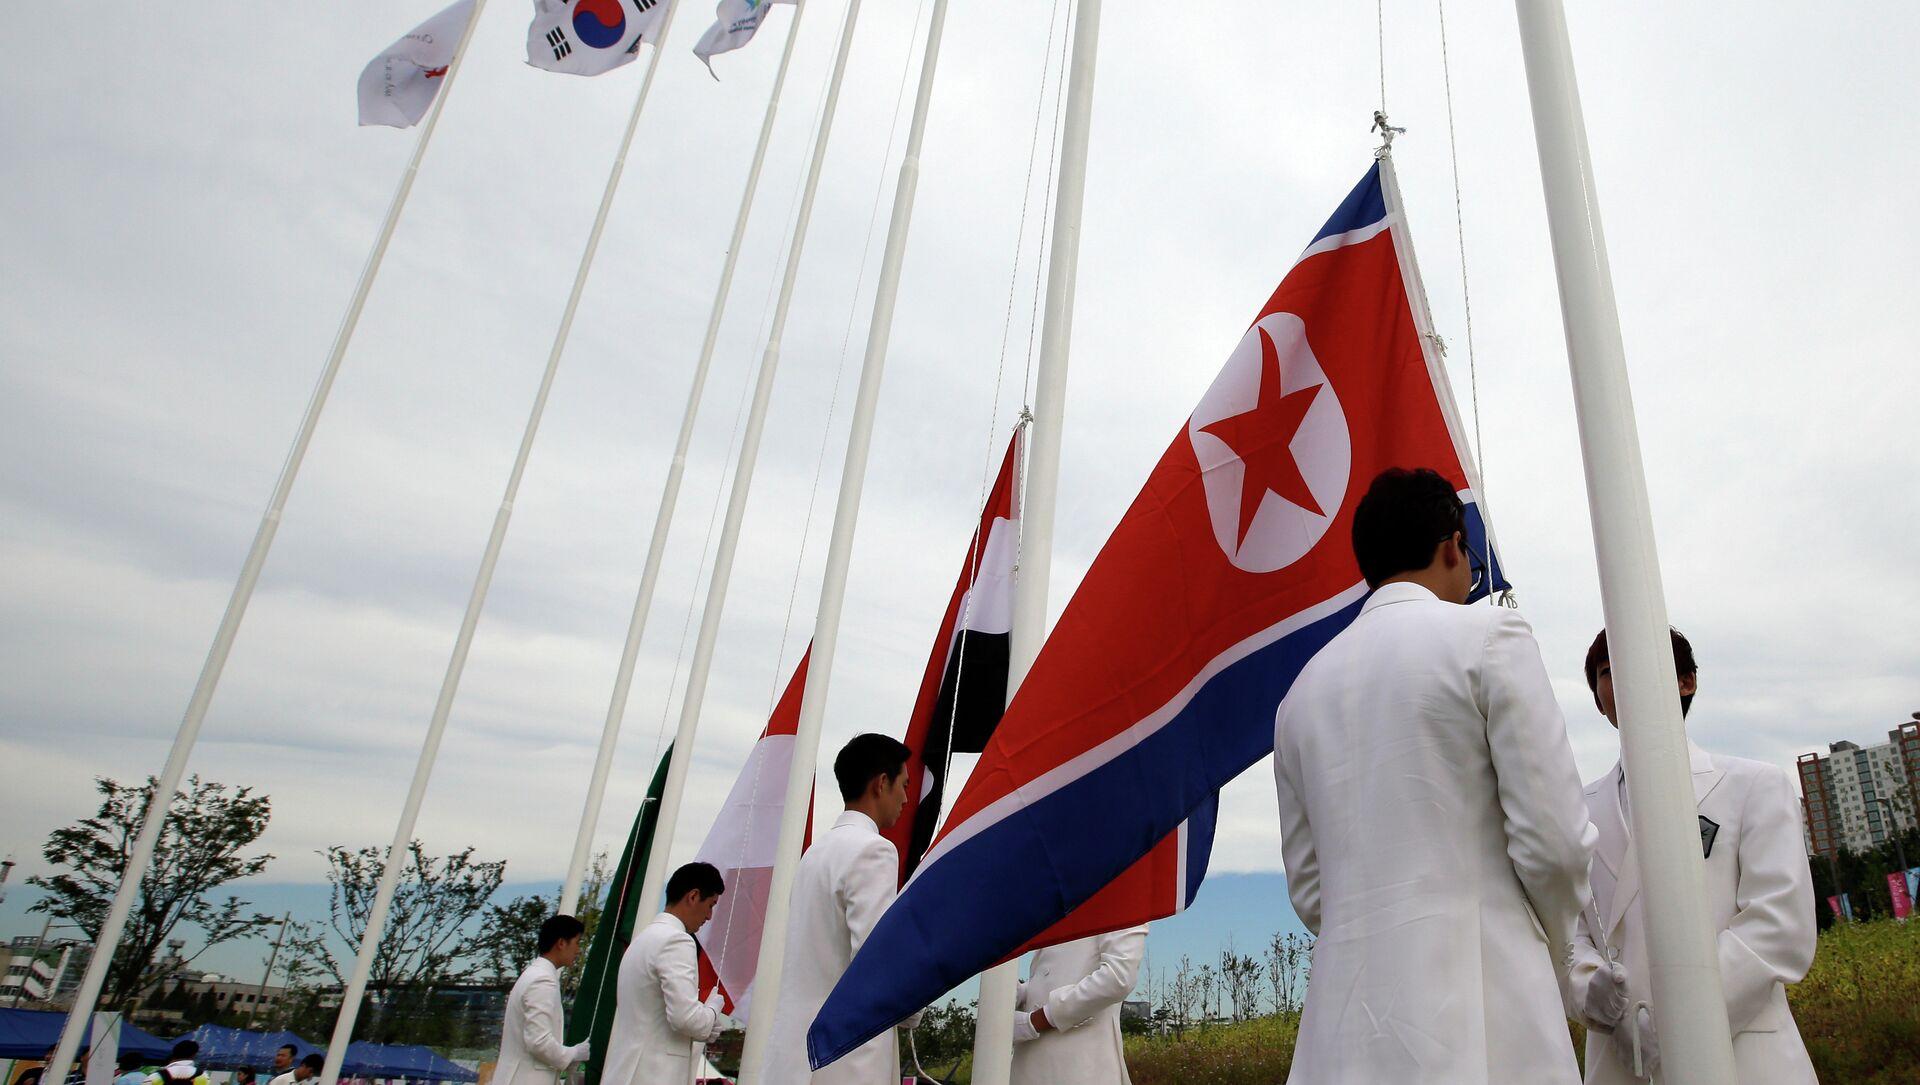 North Korea and South Korea Flag  - Sputnik International, 1920, 27.07.2021